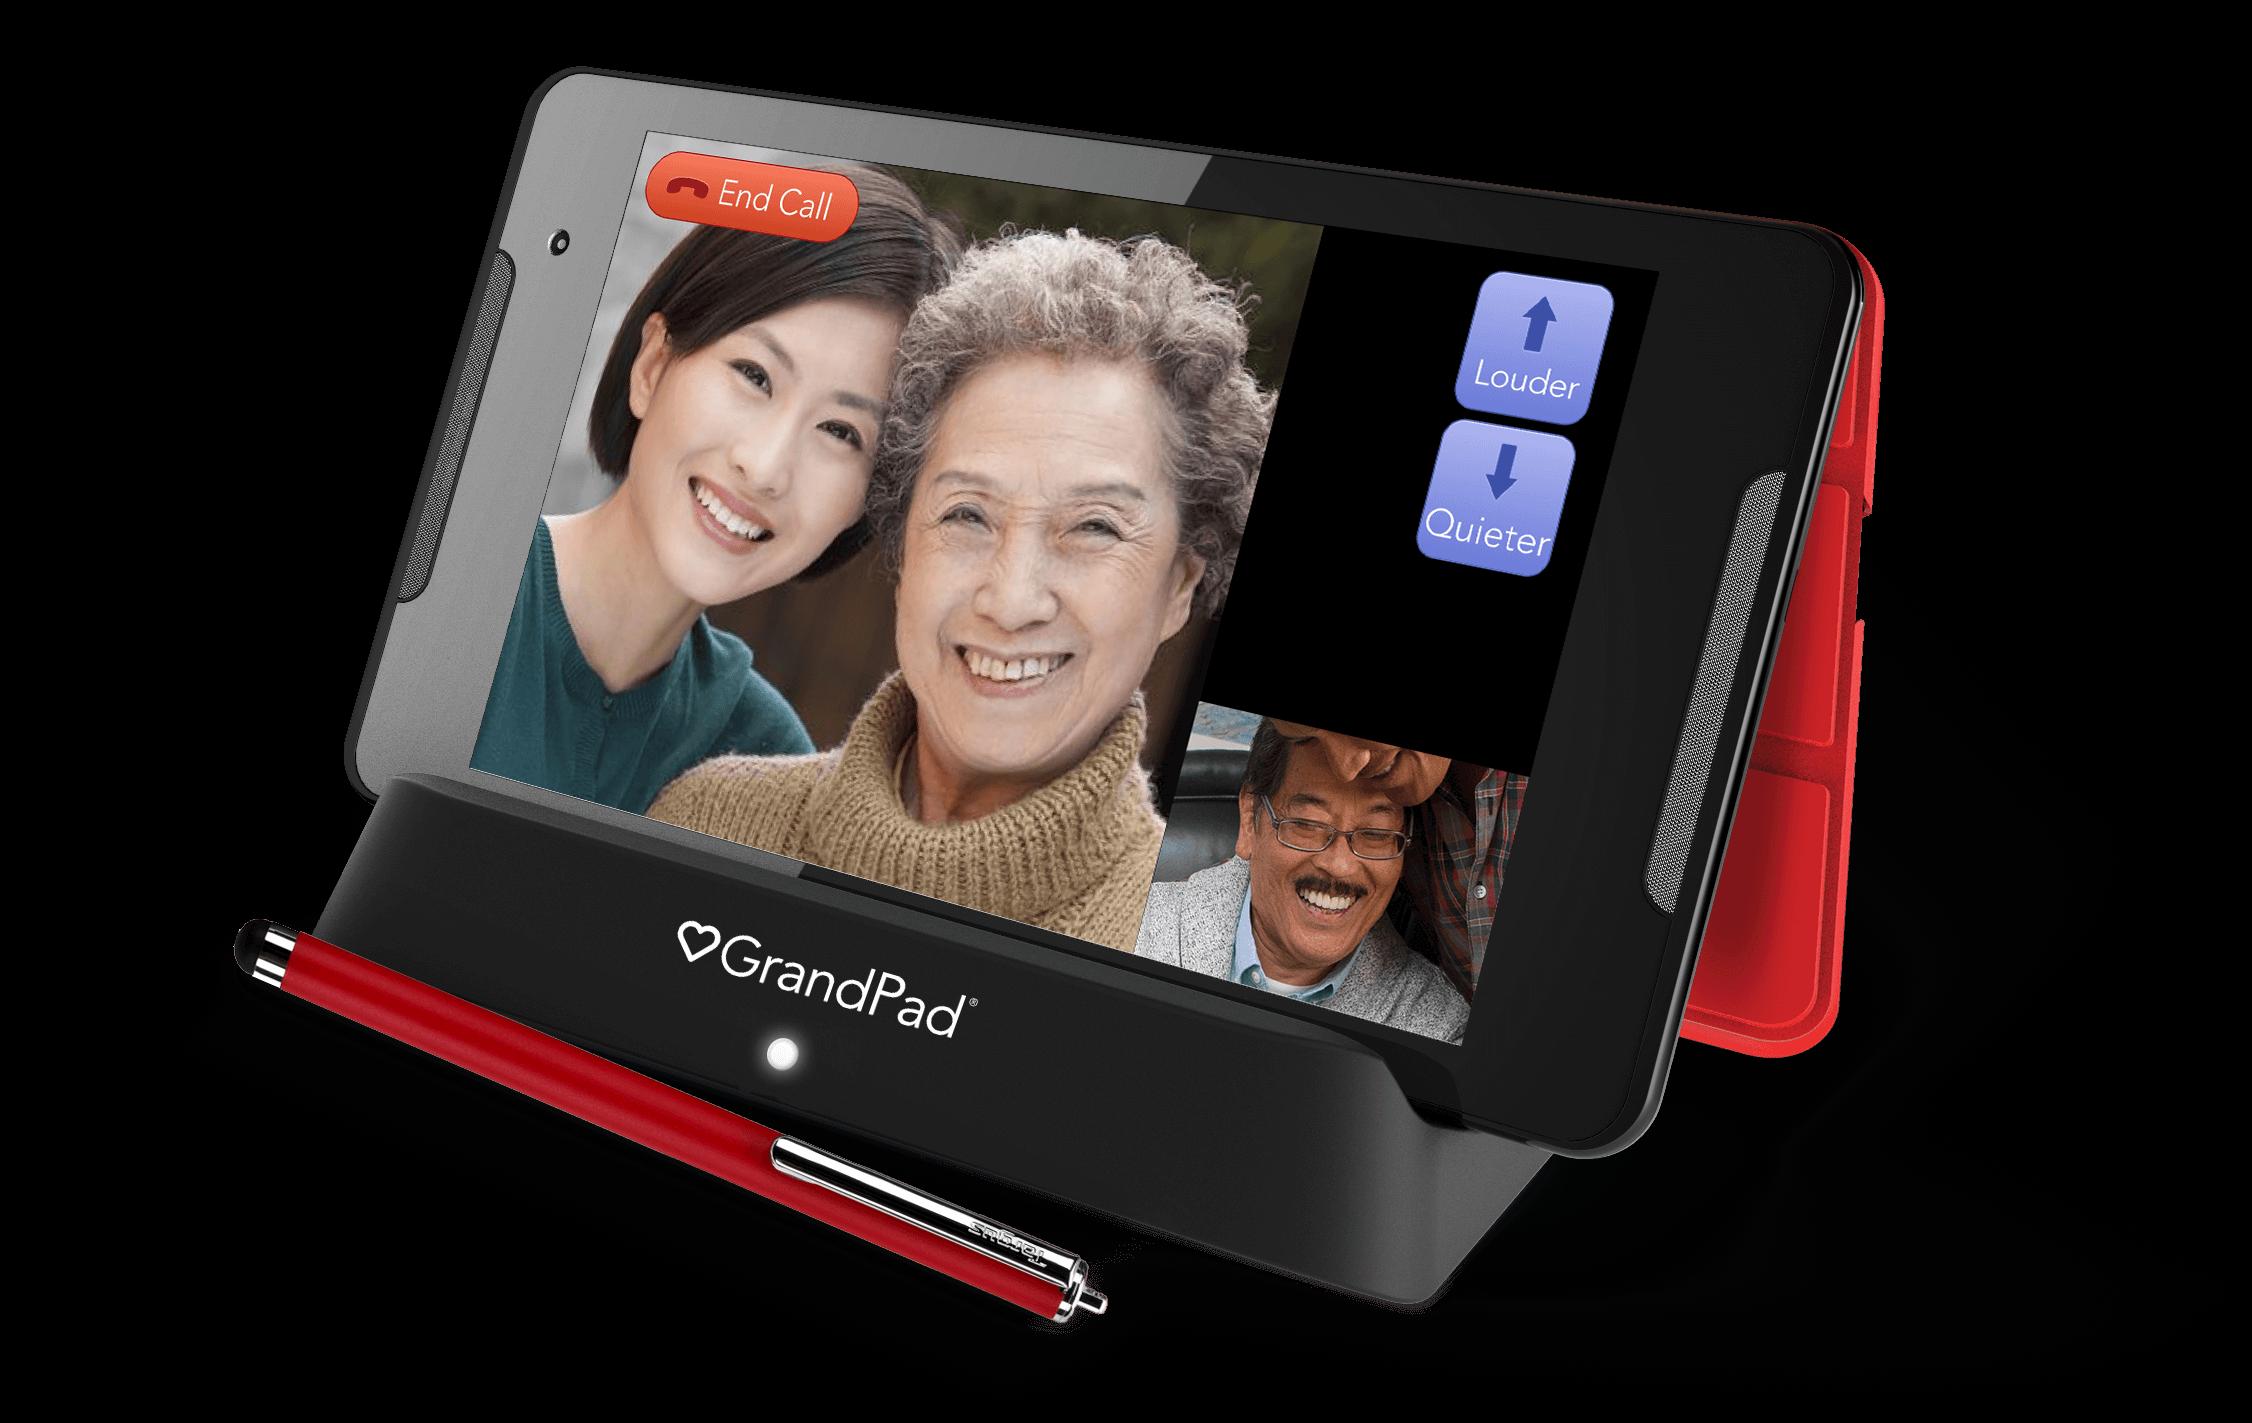 GrandPad tablet displaying Home Screen in charging cradle